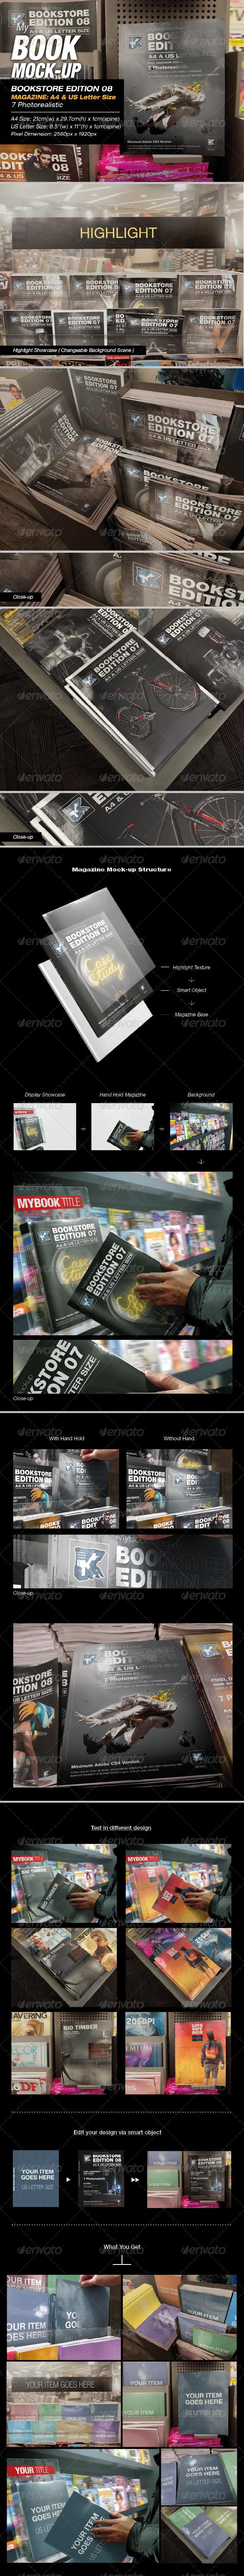 Bookstore Edition 08 Mock-up - Magazines Print